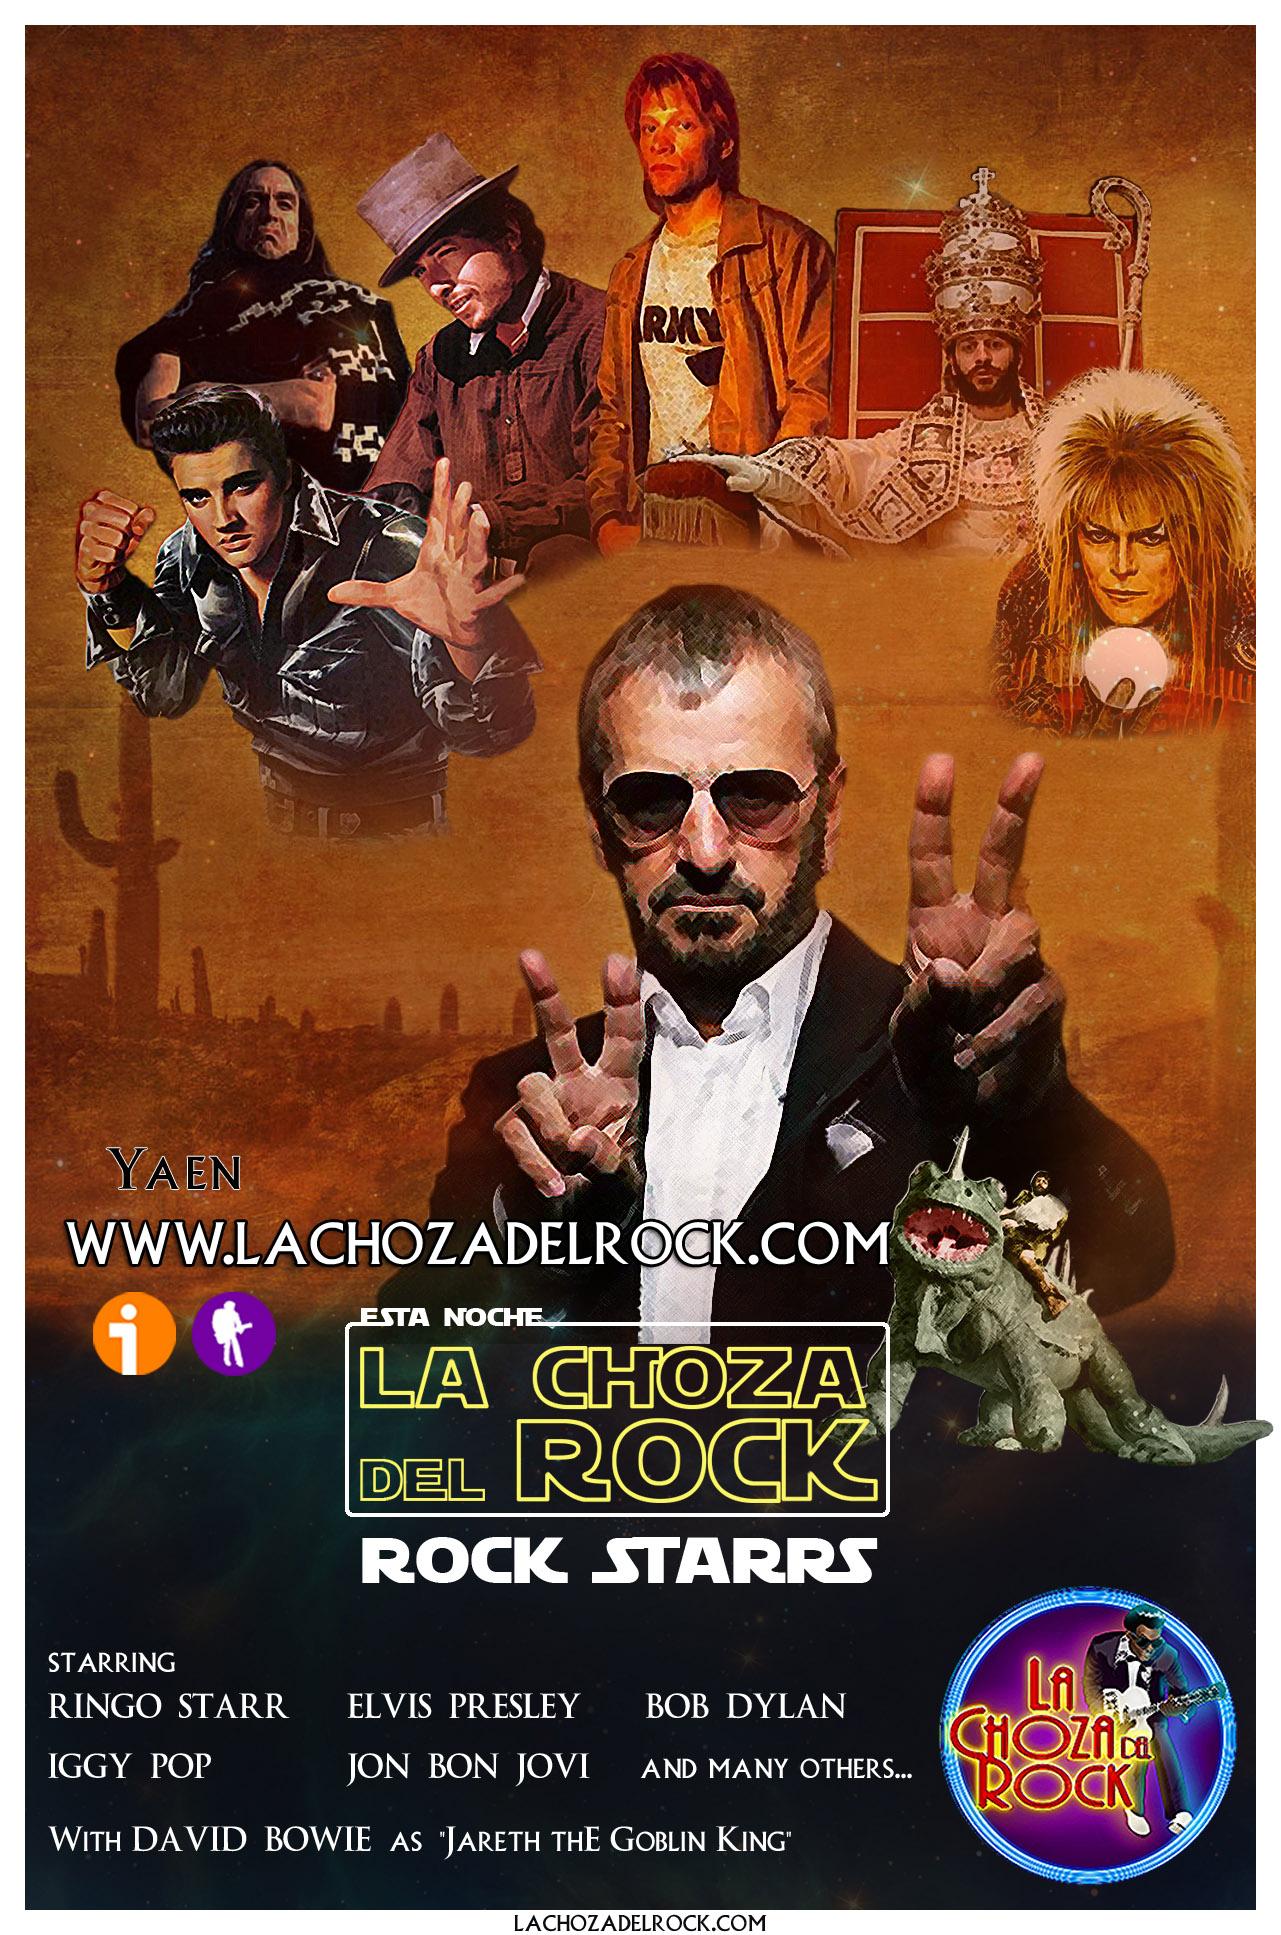 Rock Starrs de cine en la Choza del Rock